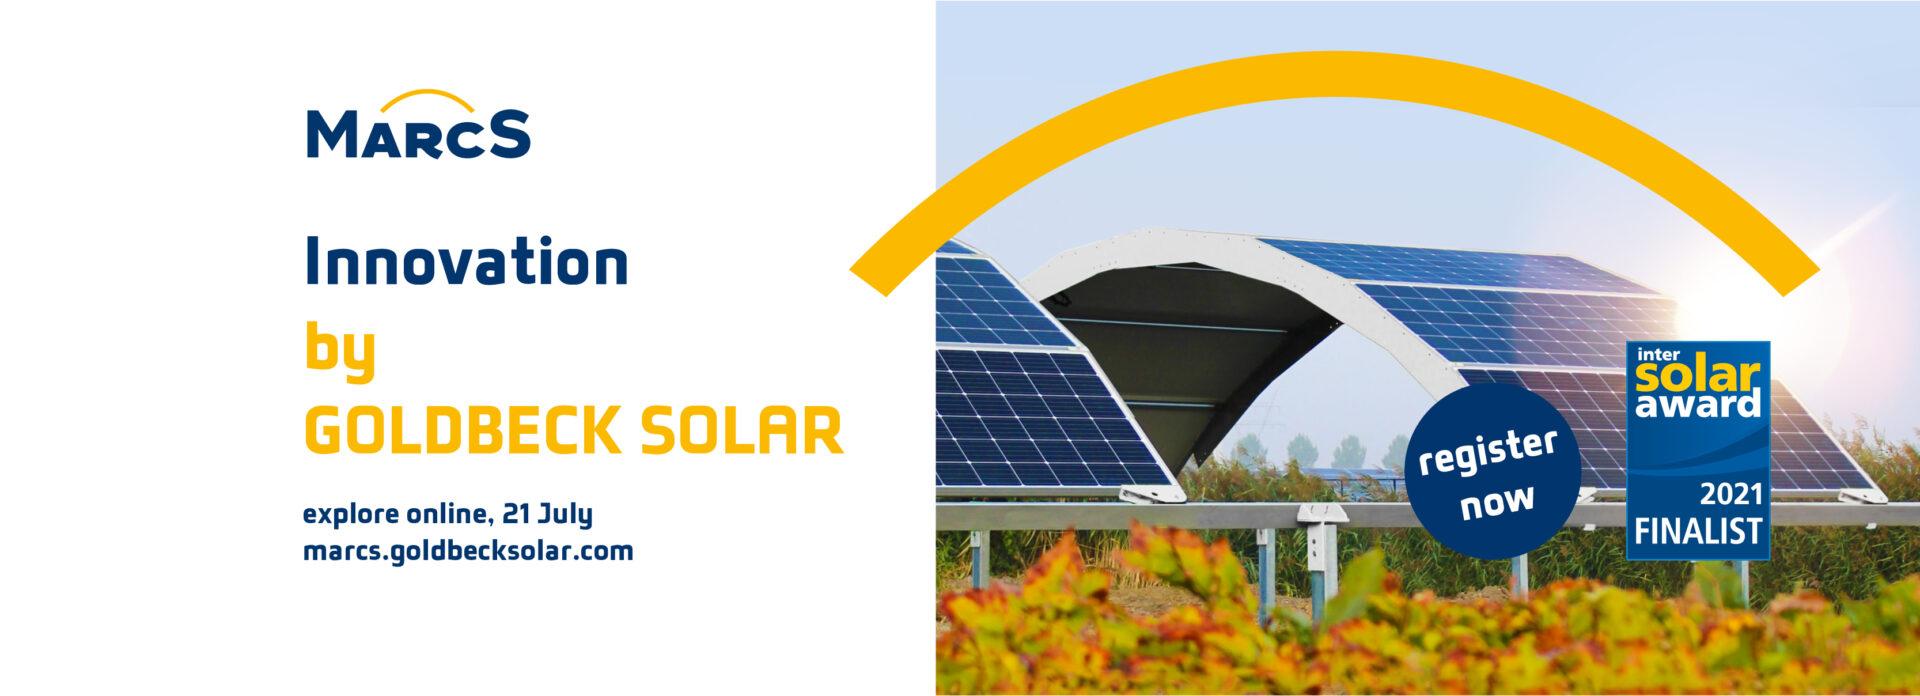 MarcS Innovation inspired by GOLDBECK SOLAR